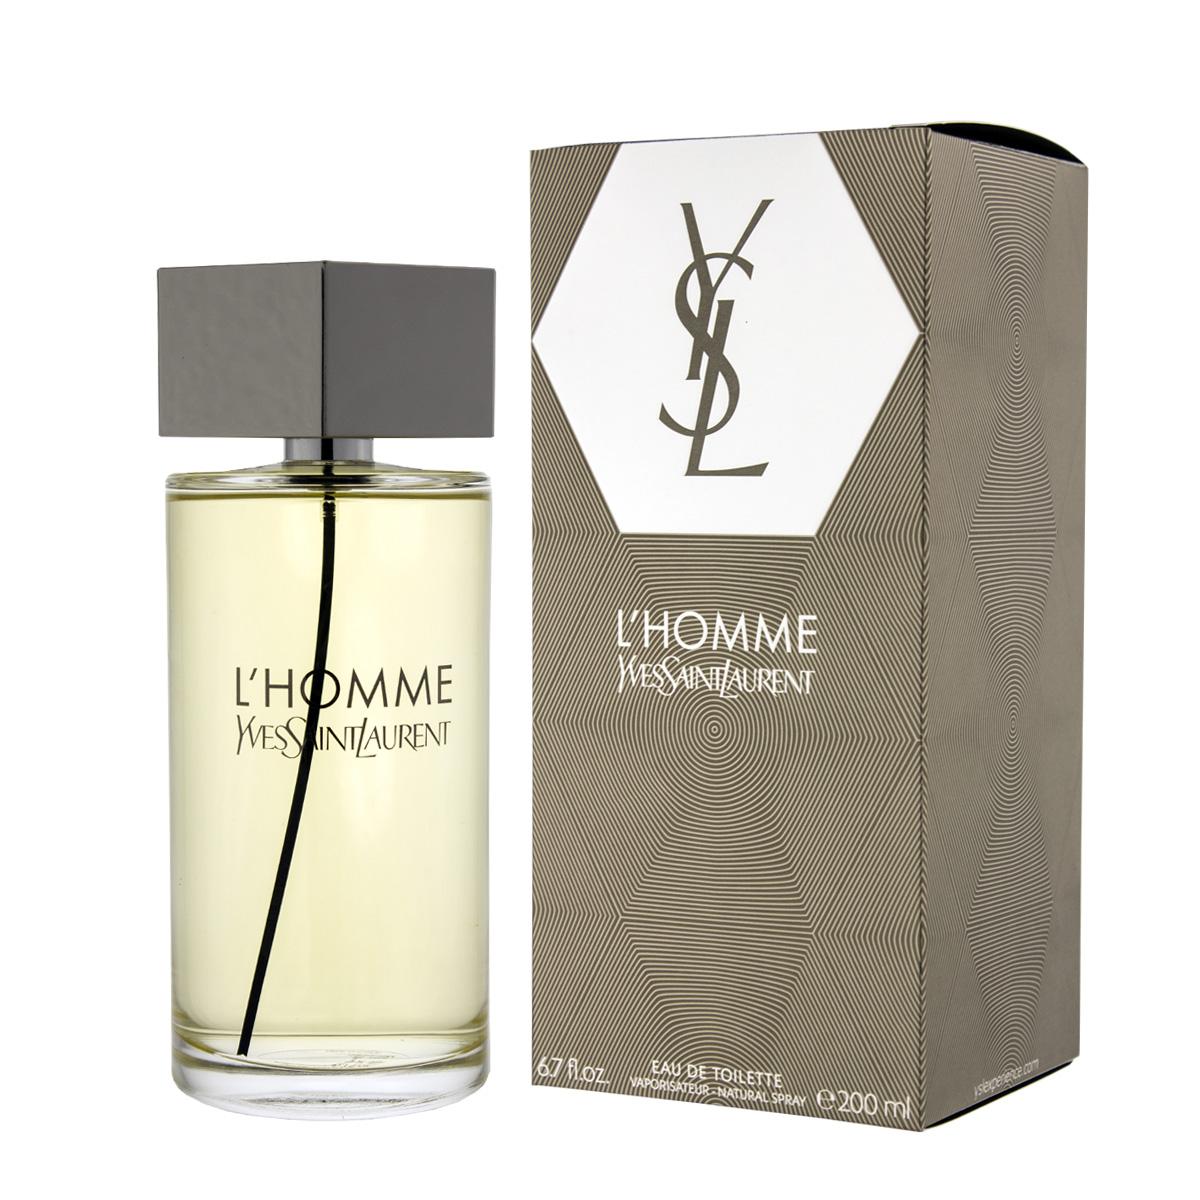 Yves Saint Laurent L'Homme EDT 200 ml M